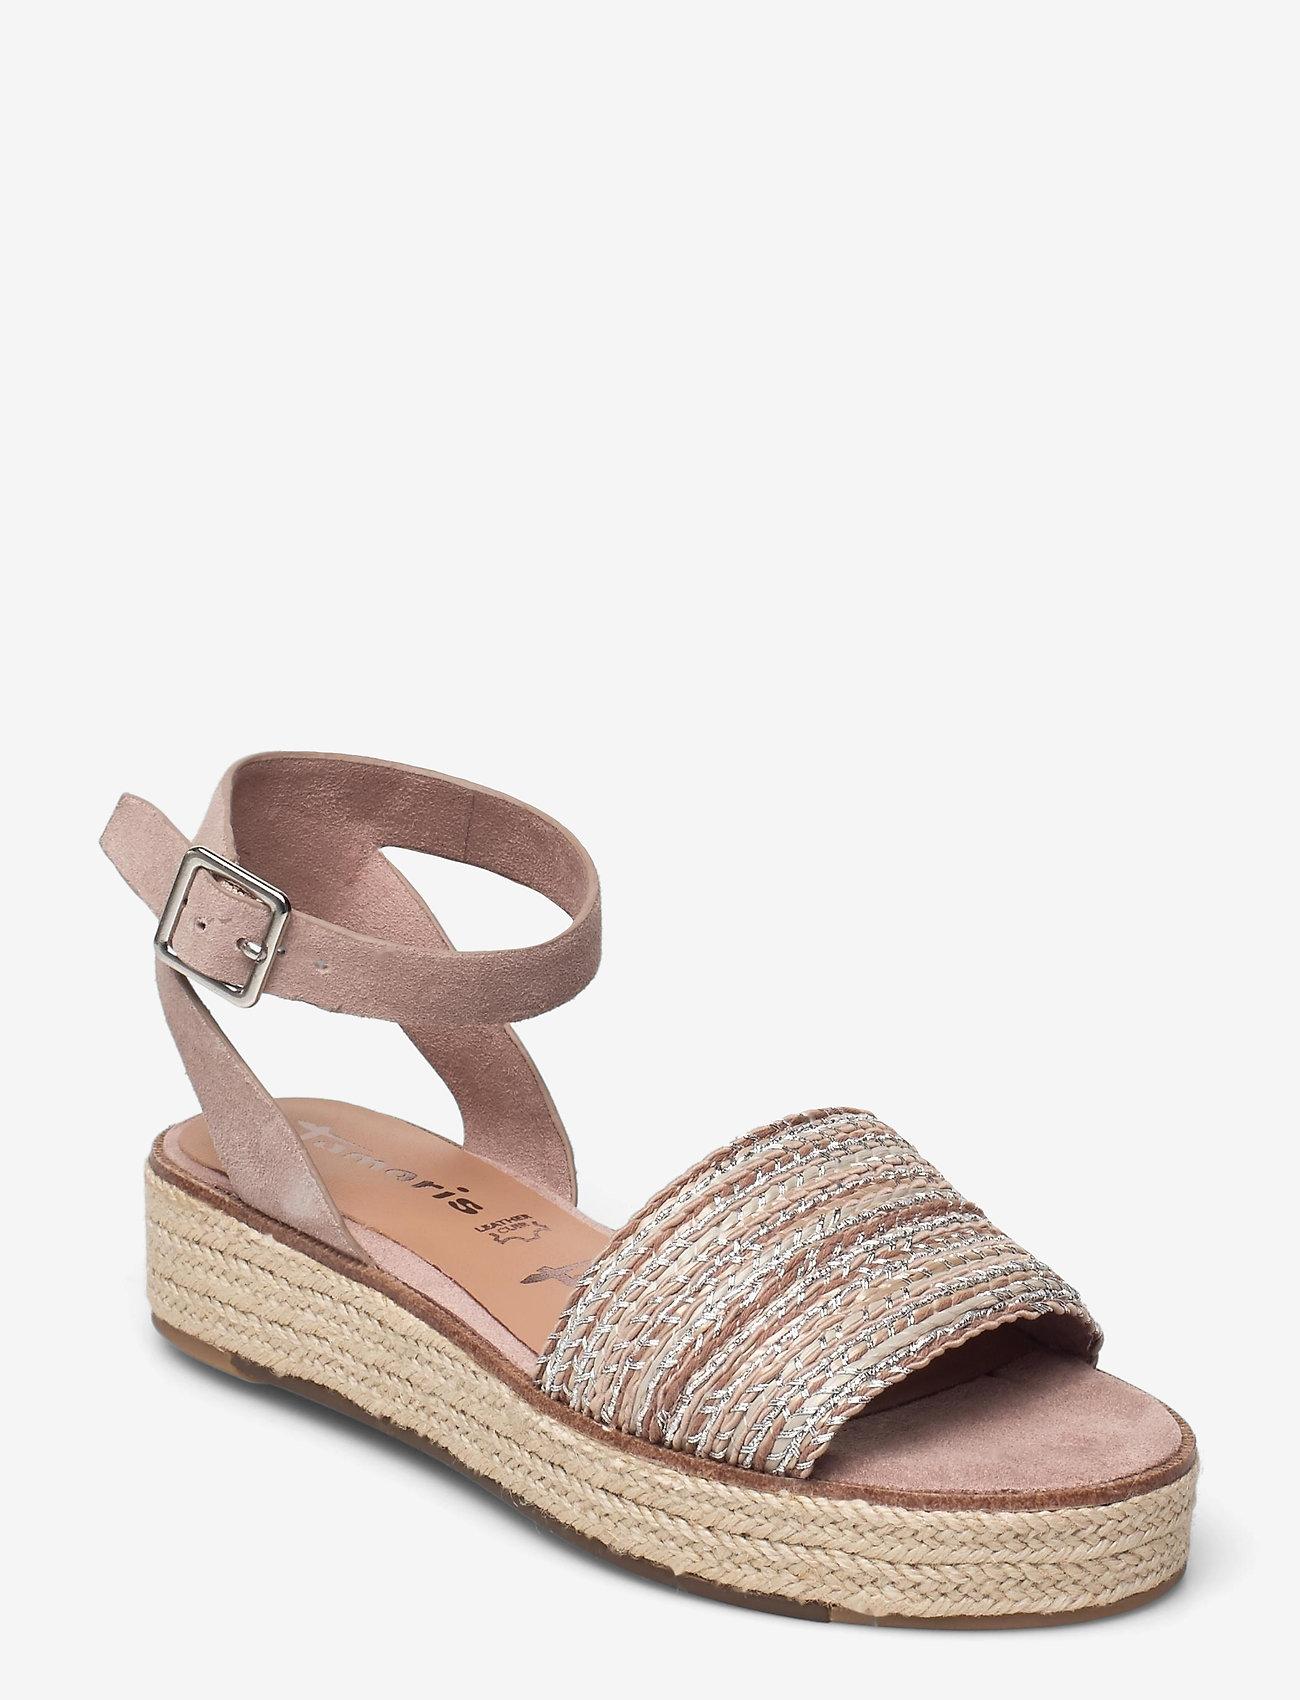 Tamaris - Woms Sandals - flache espadrilles - old rose - 1